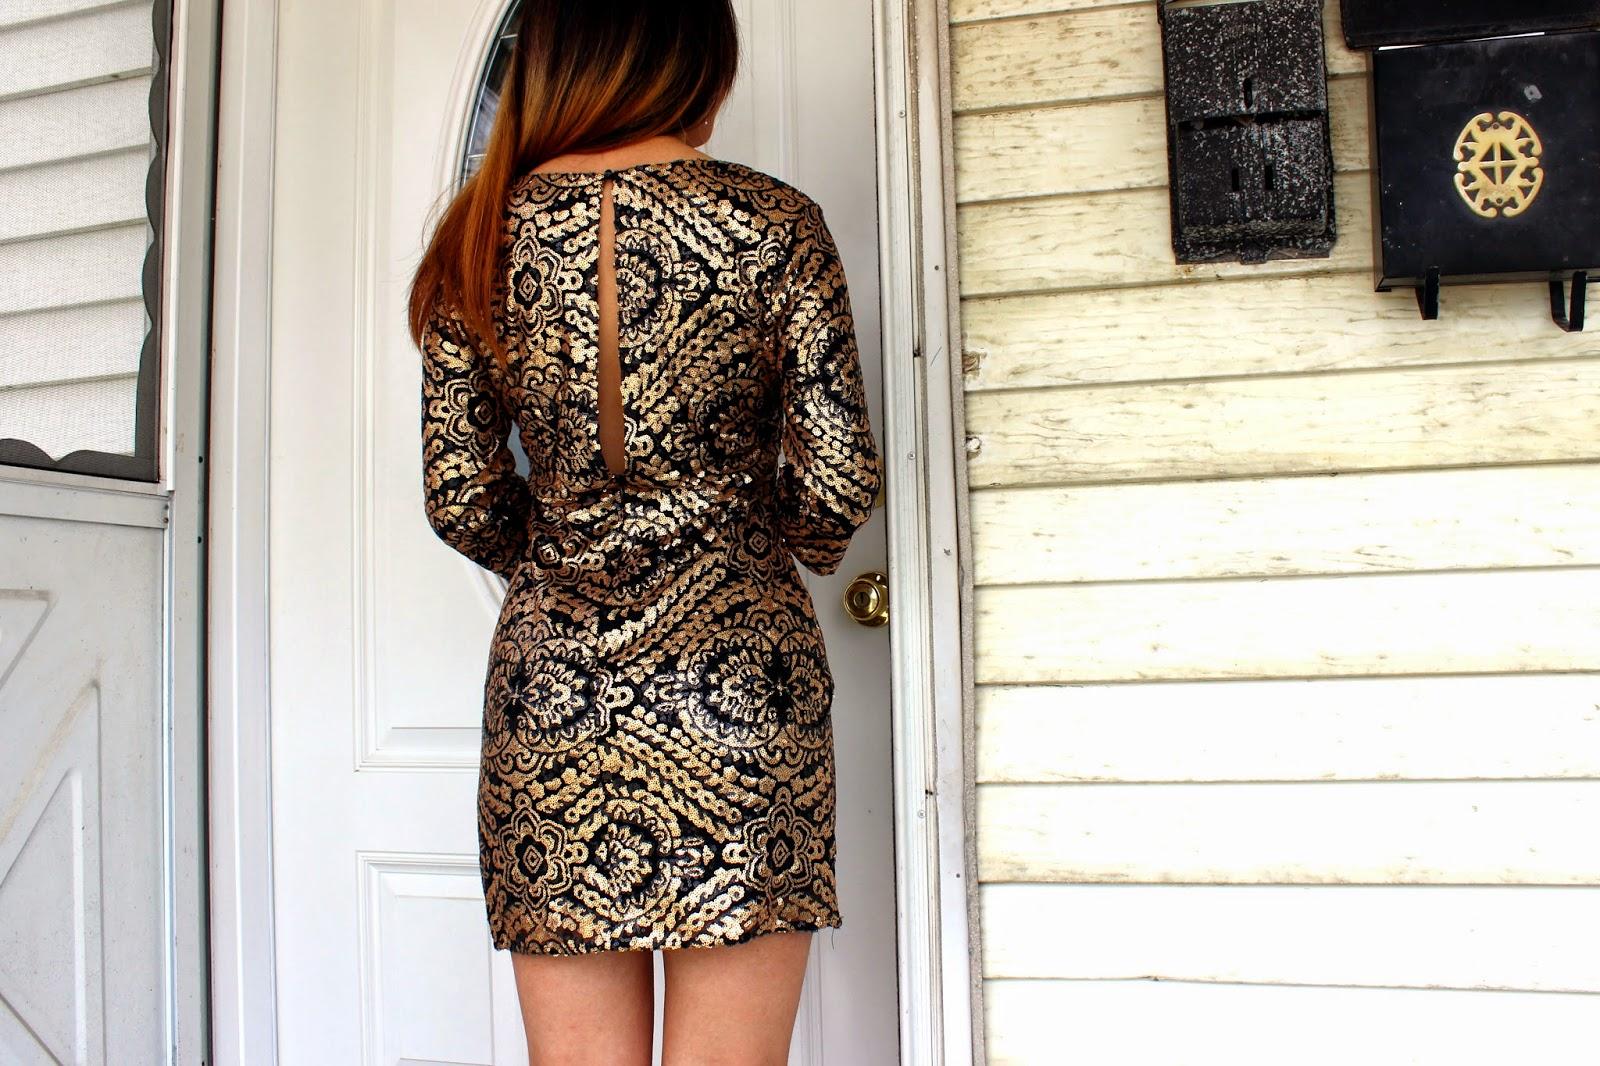 Sequined Baroque Bodycon Dress